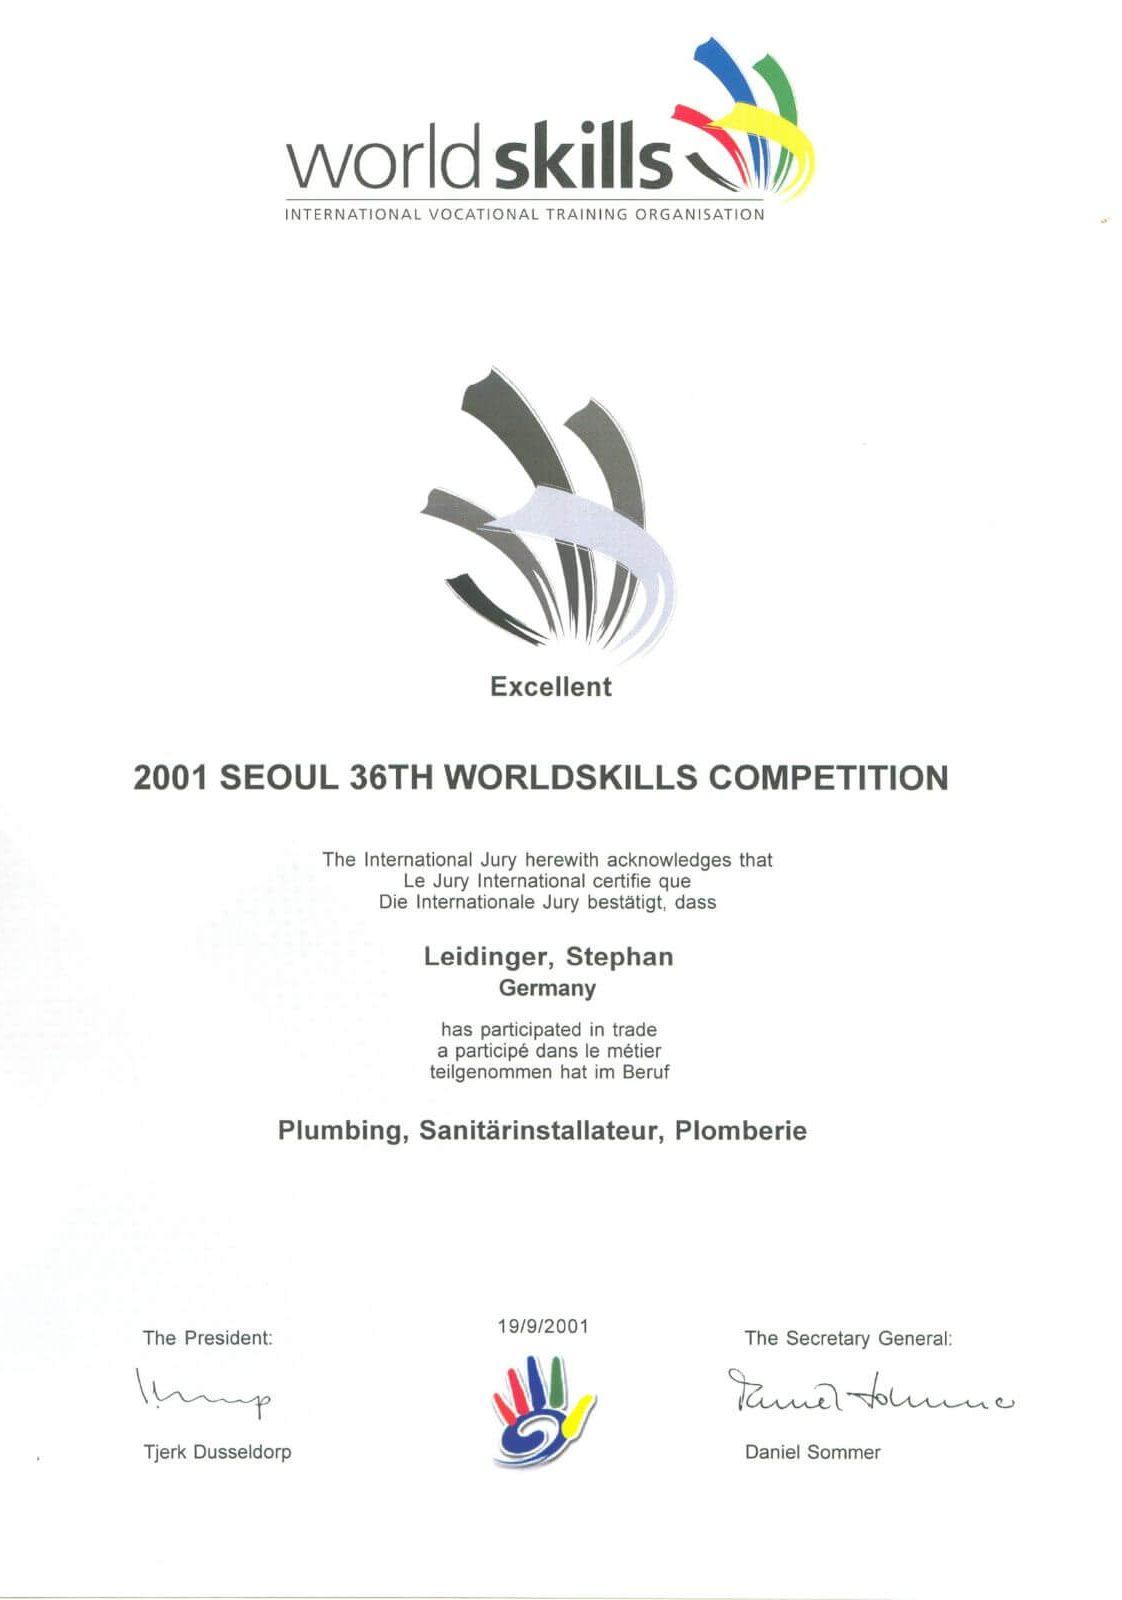 world_skills-1